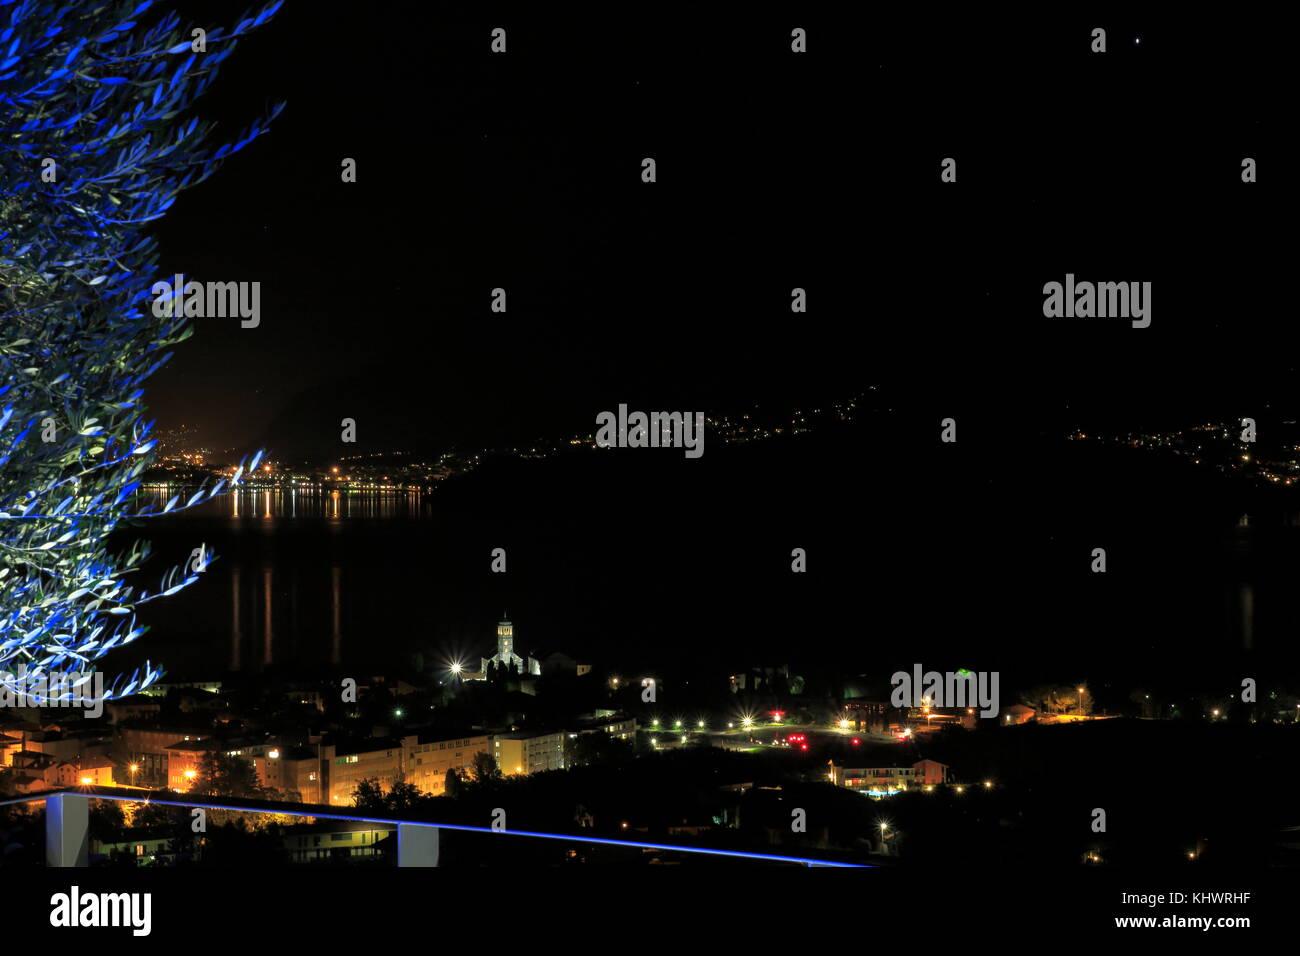 Blick auf Gravedona am Comer See bei Nacht - Stock Image